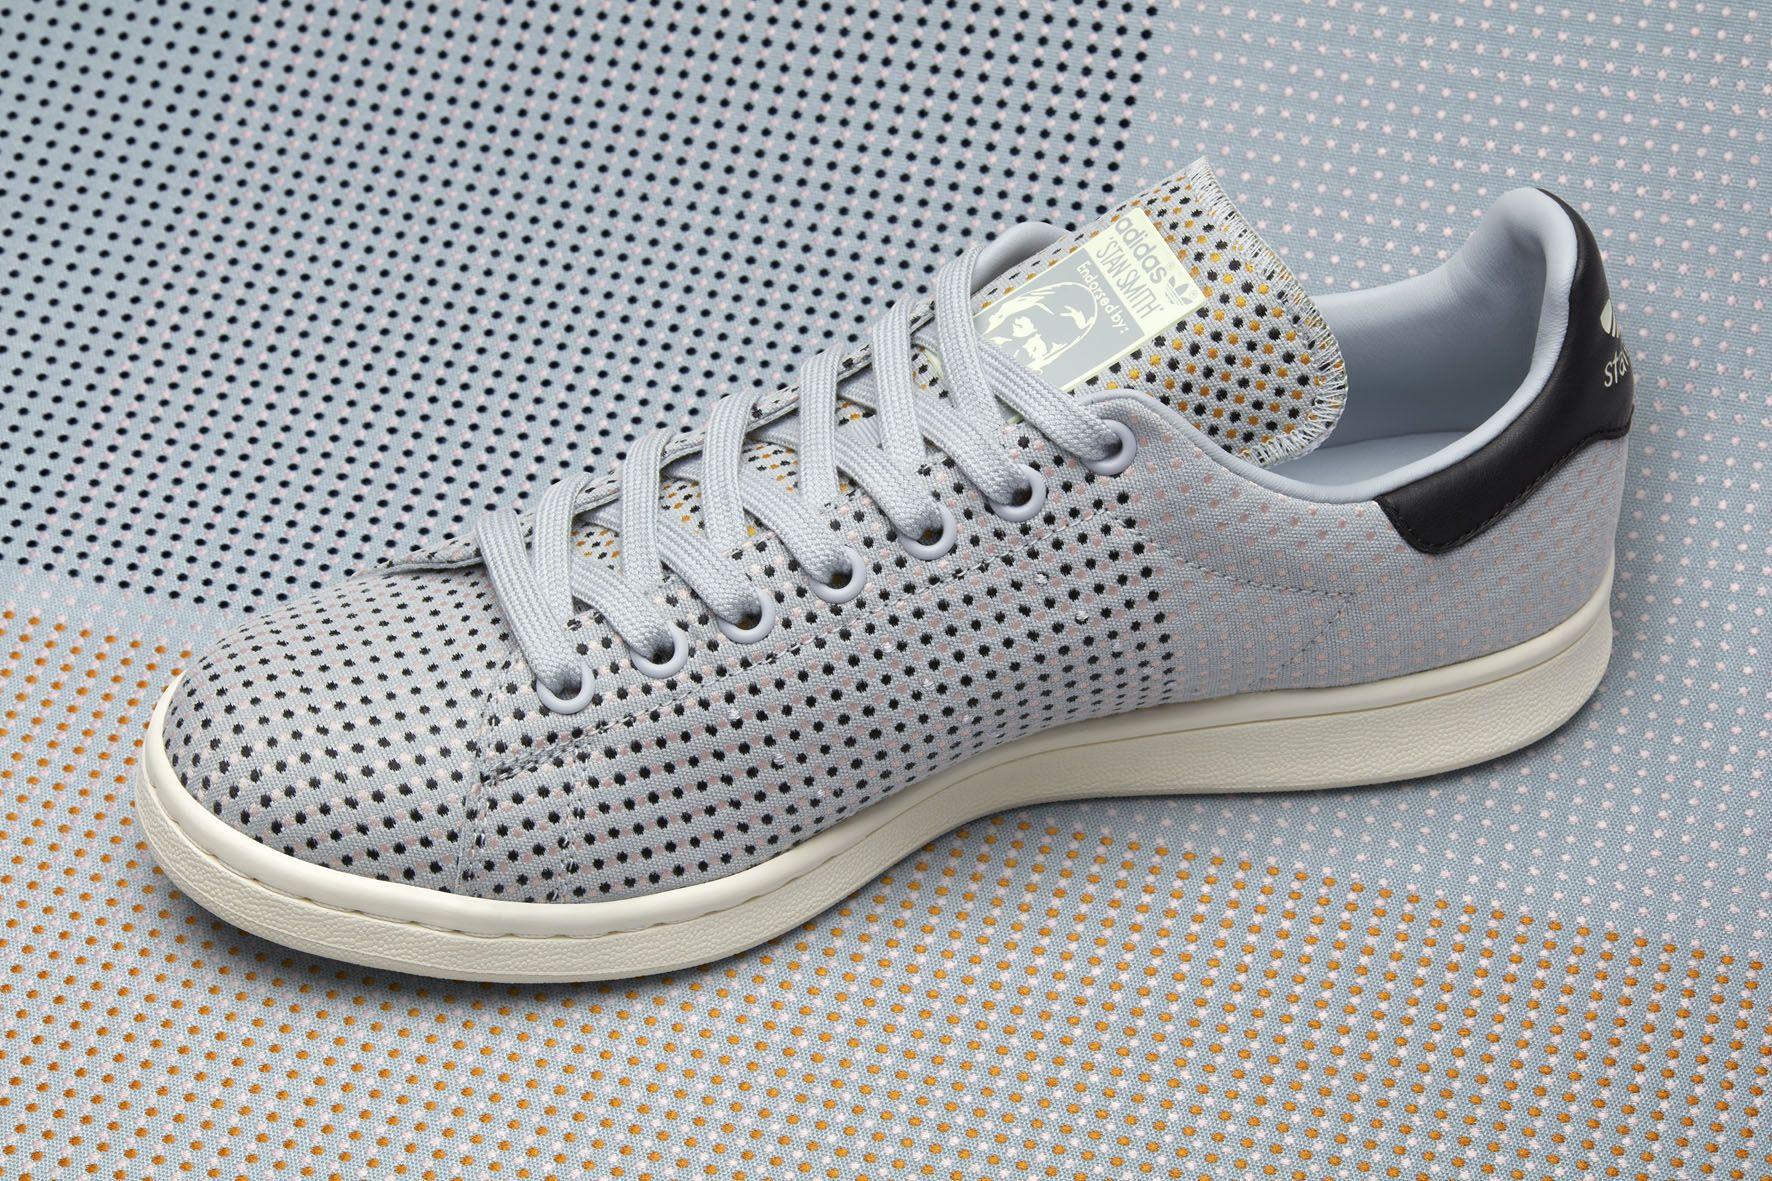 Kvadrat x adidas Originals, diseño, diseñador, Kvadrat, Adidas